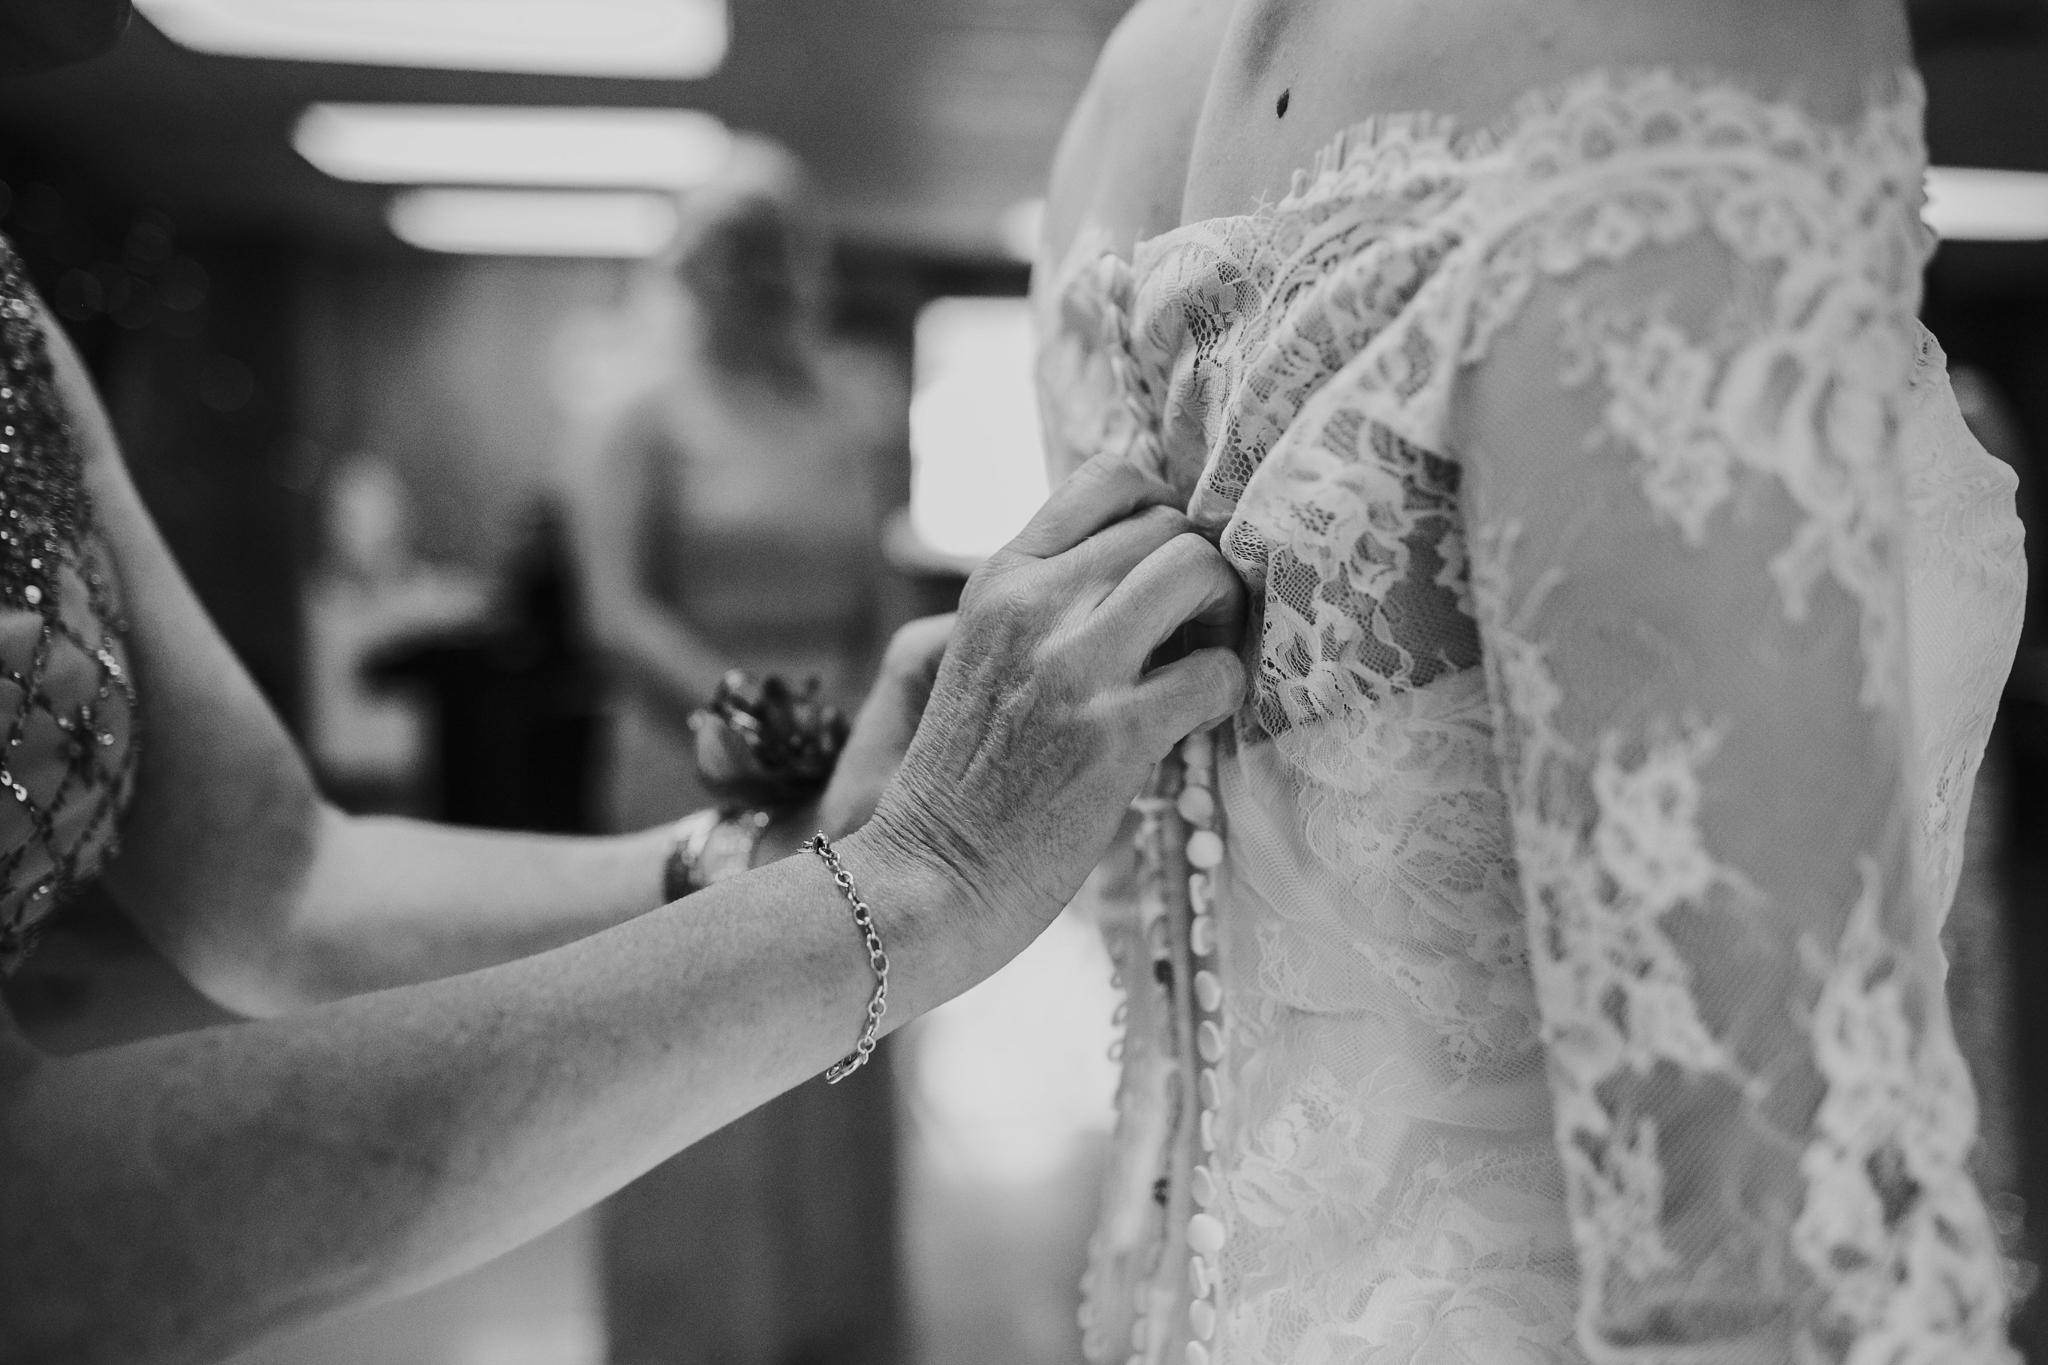 20151230_hussem_wedding_0137_web.jpg